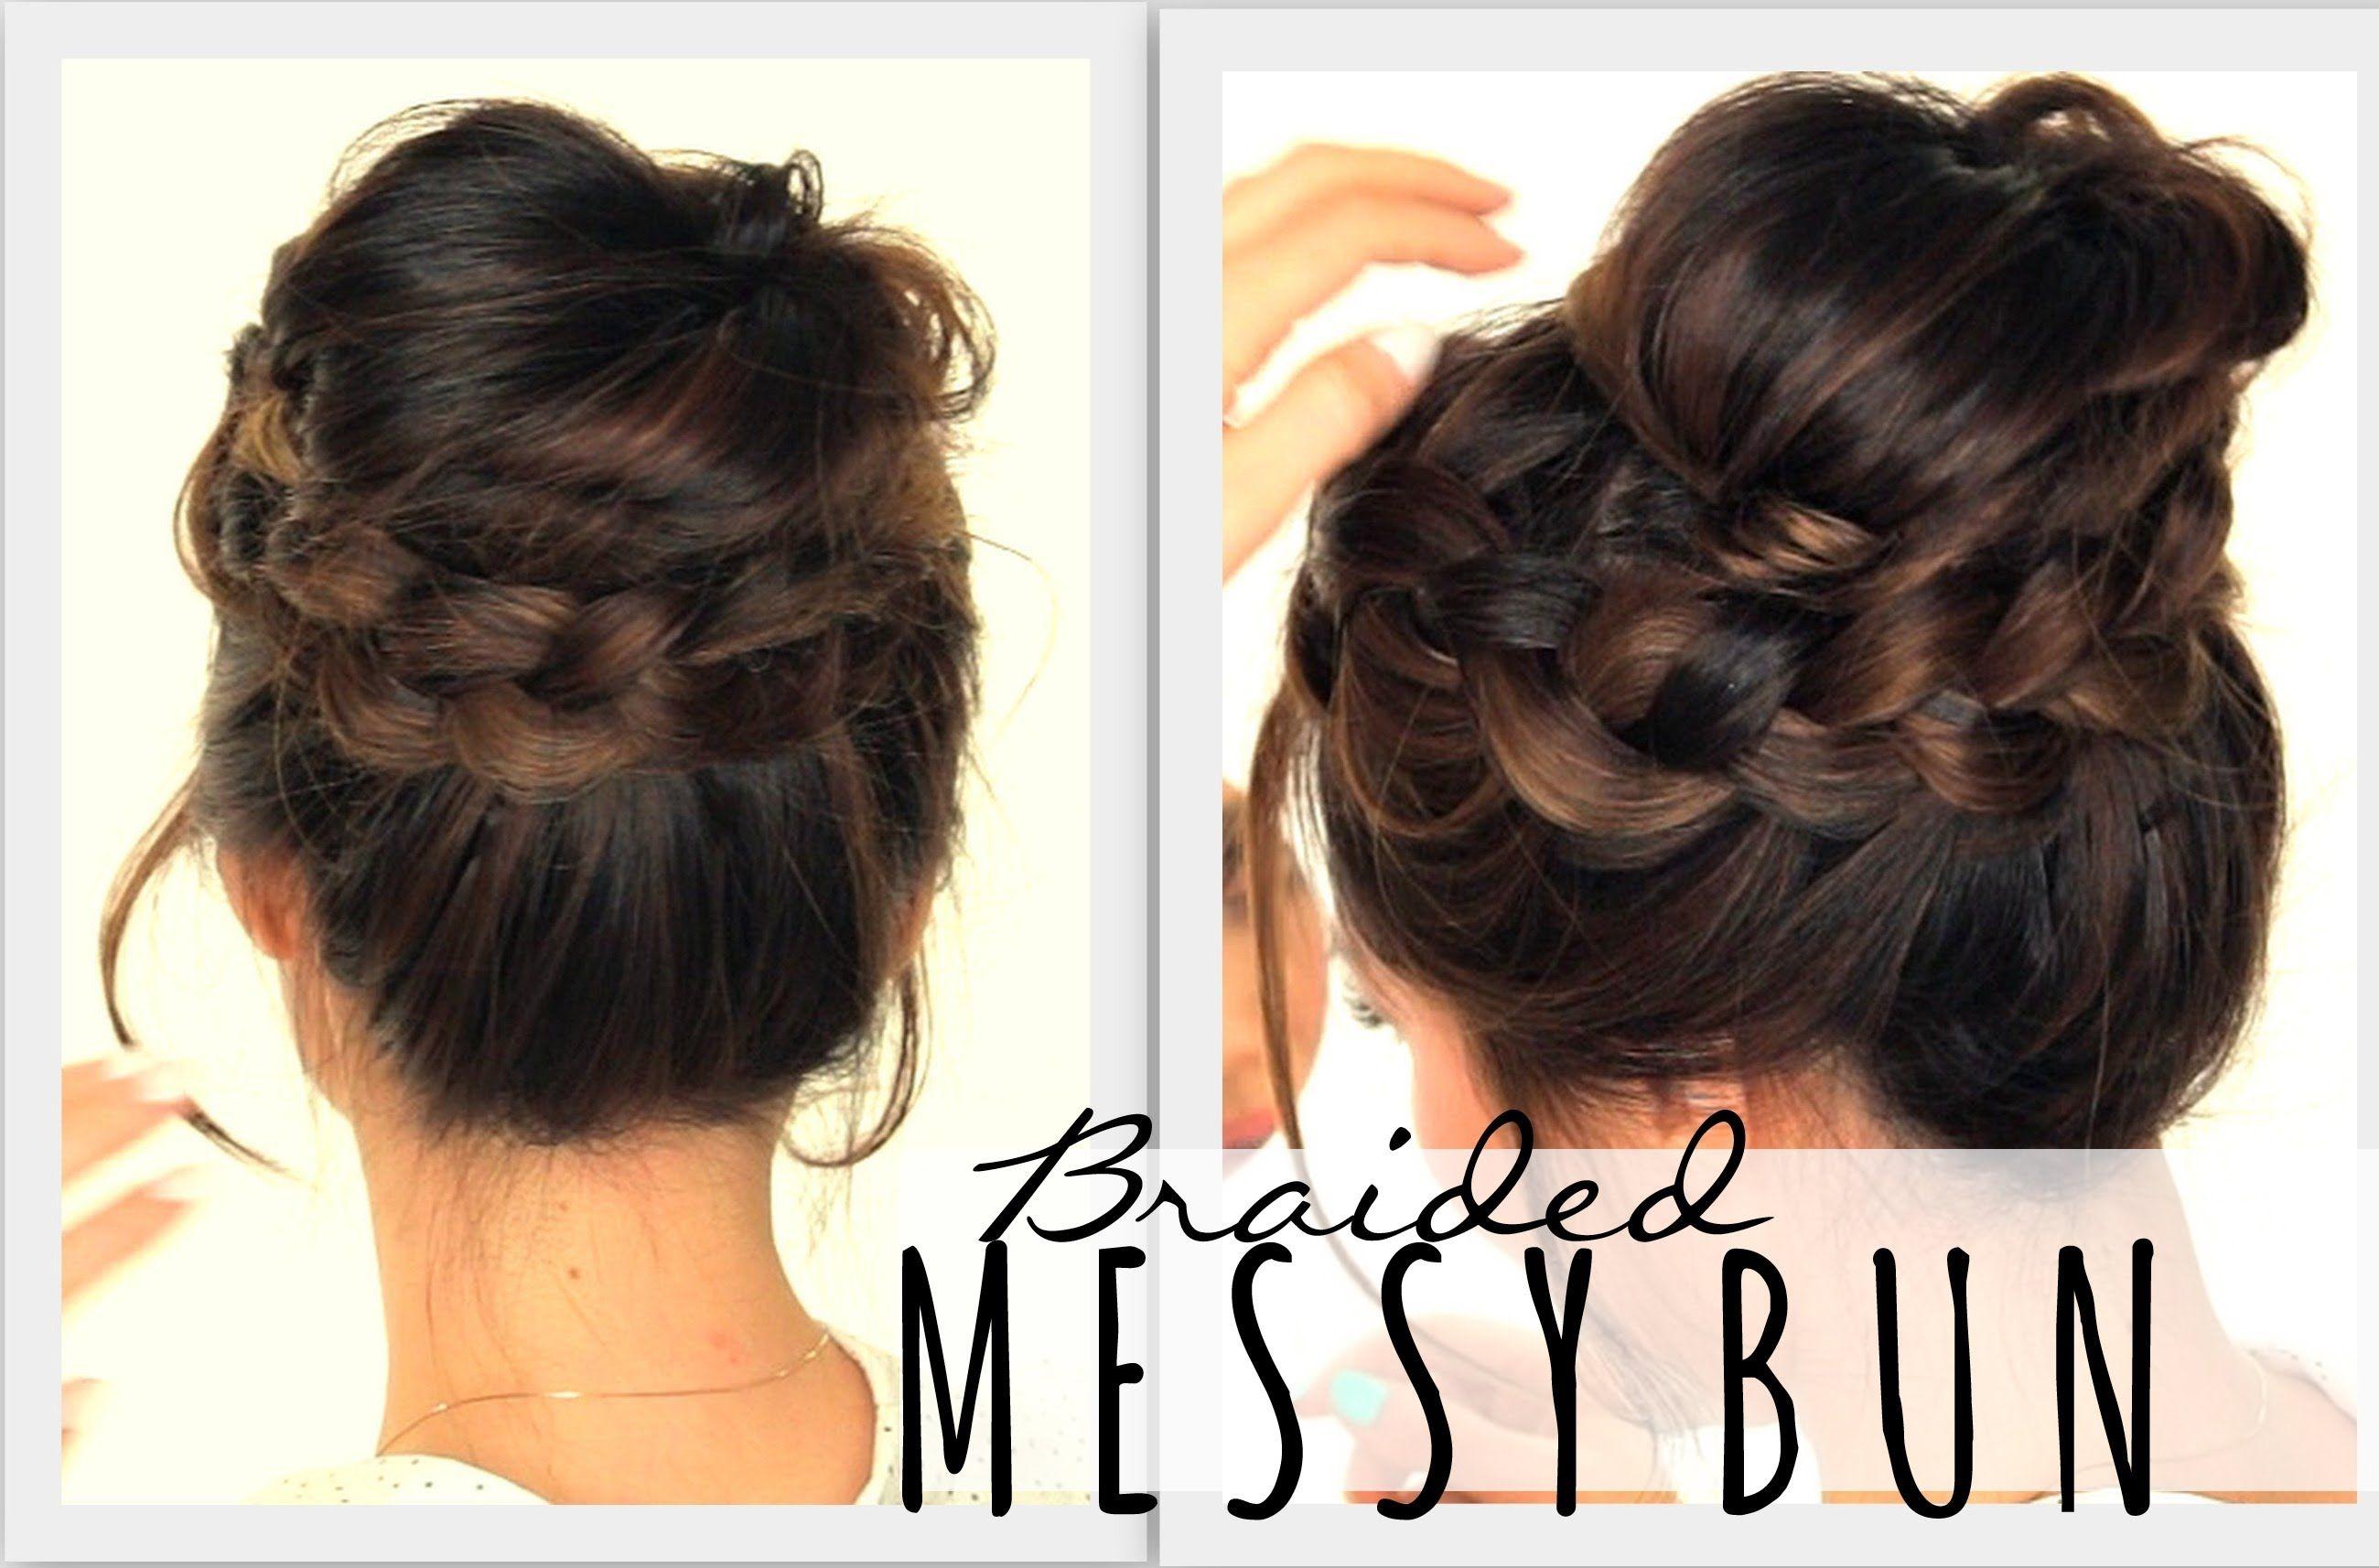 2nd Day Hairstyles Messy Bun Crown Braid Hair Tutorial